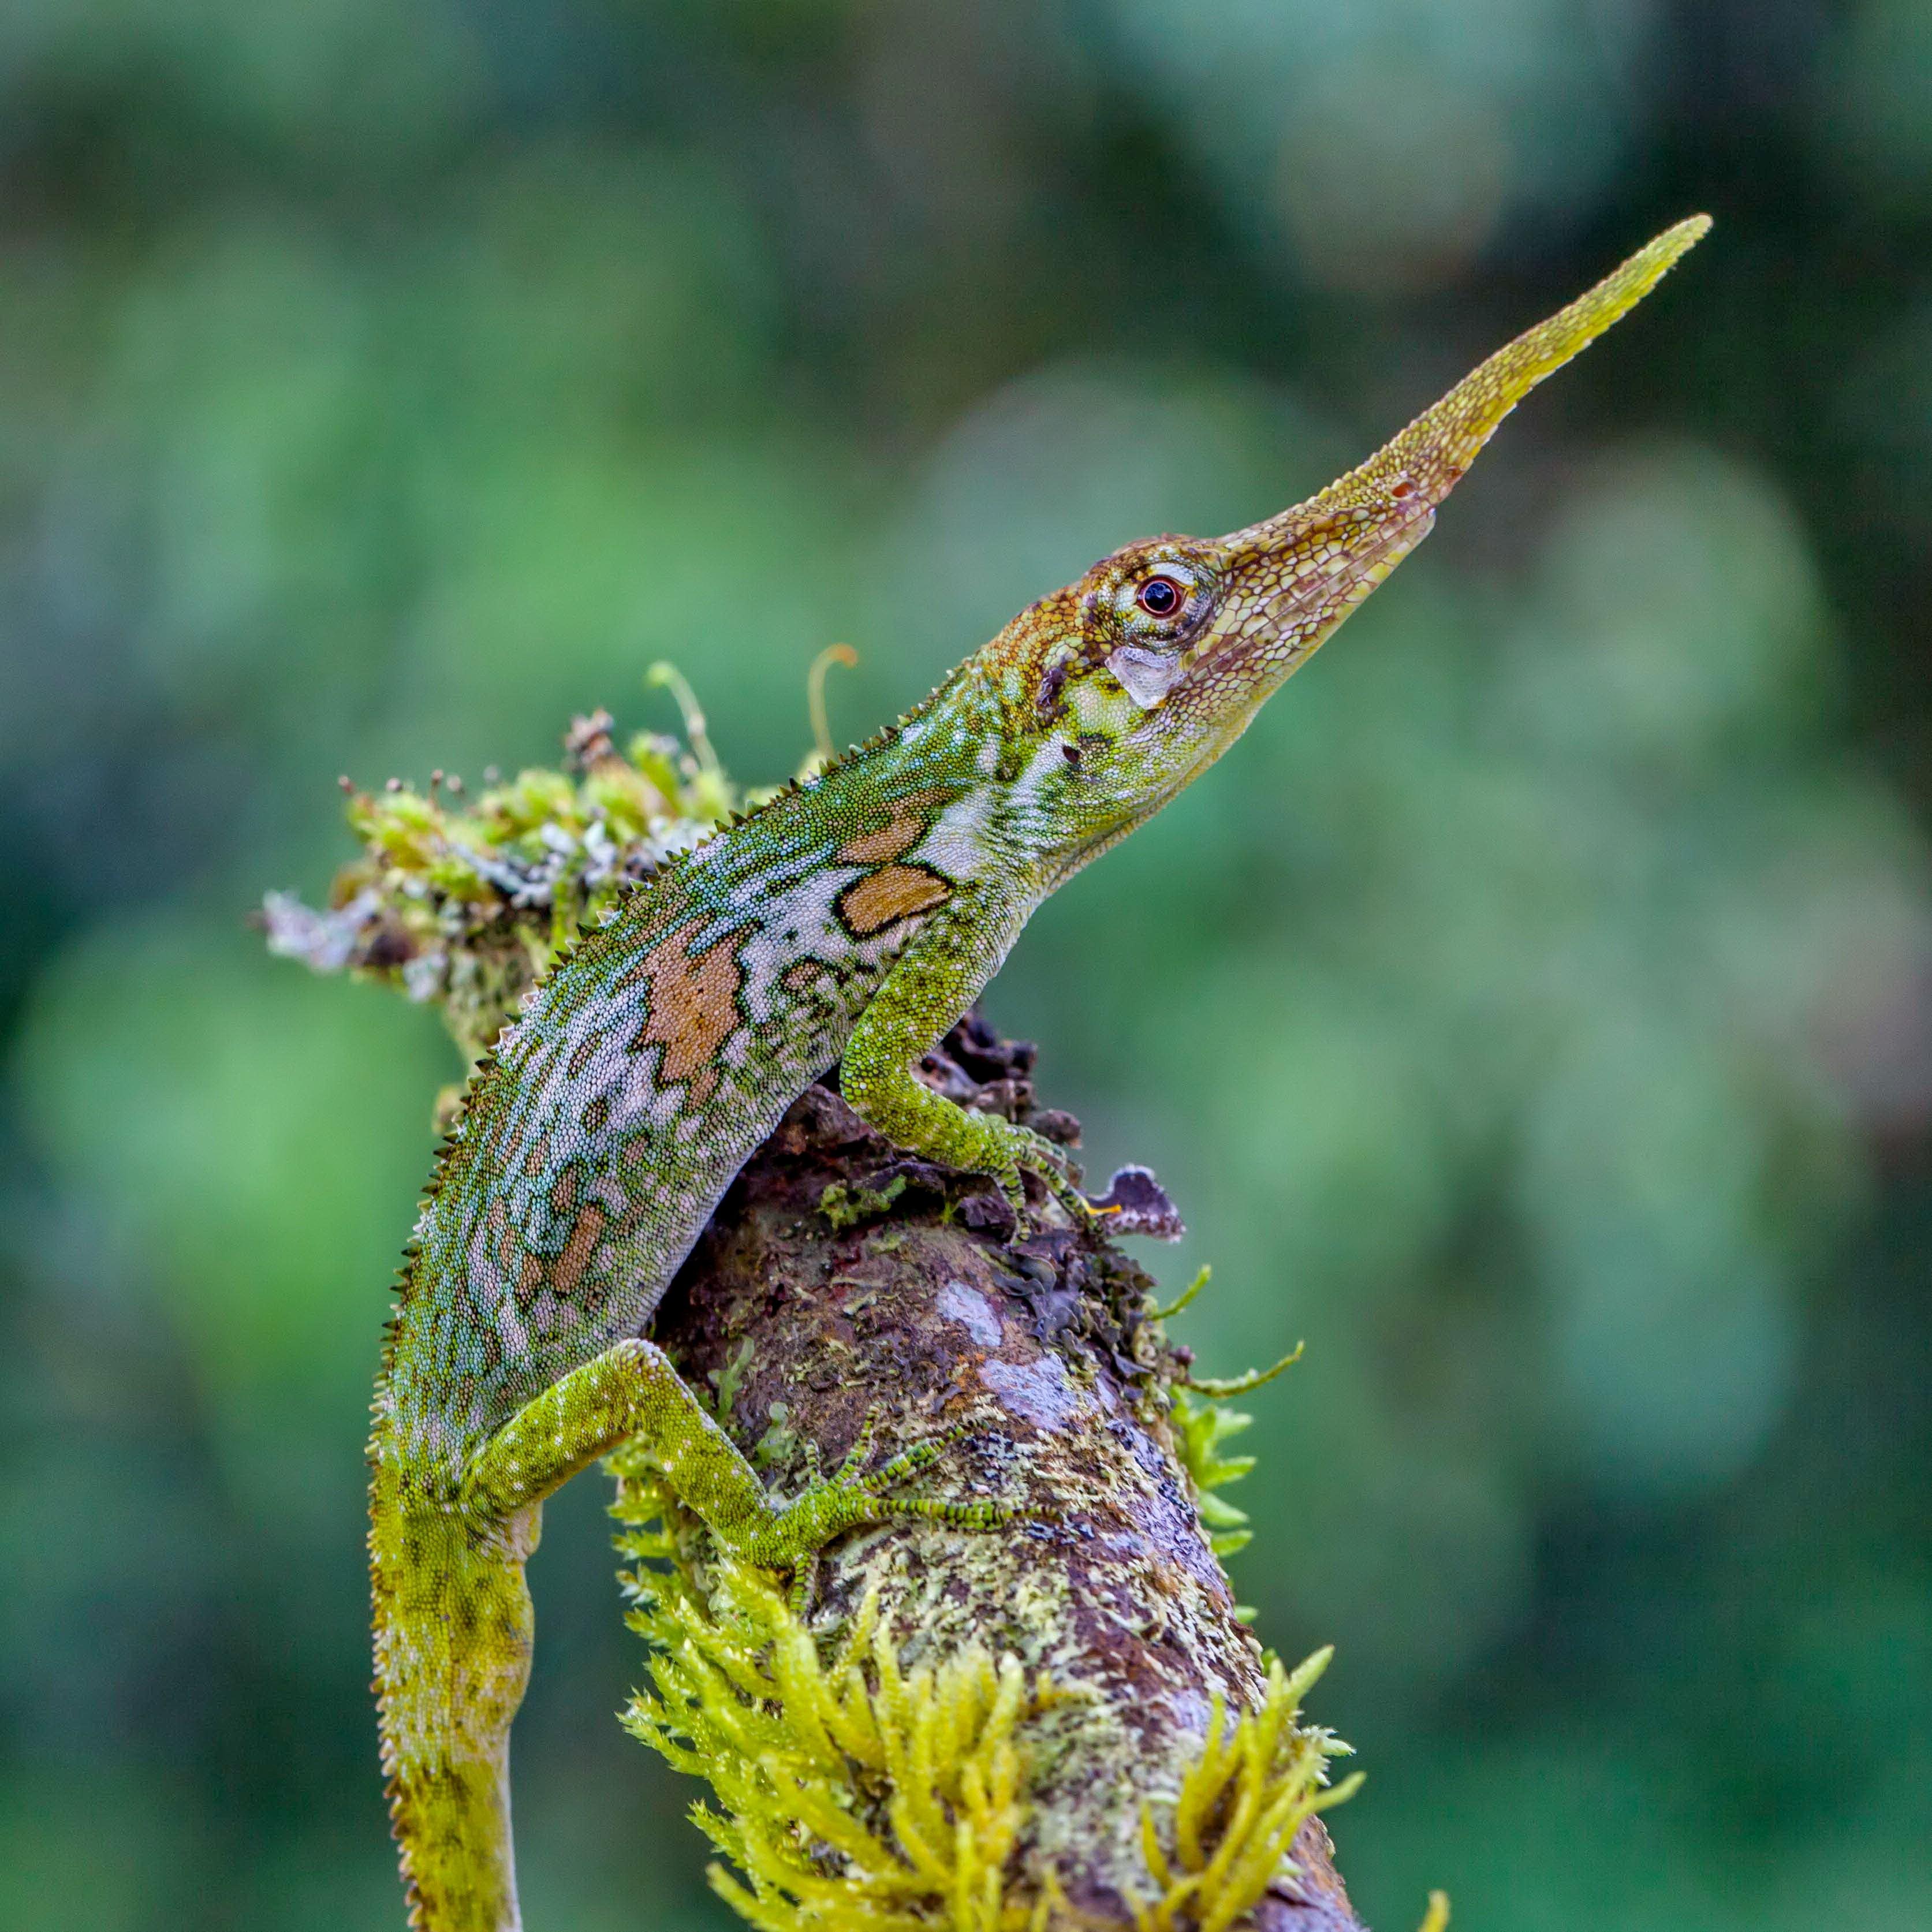 Cute Friends Wallpapers For Facebook Wallpaper Pinocchio Lizard Ecuador Green Nature Animal